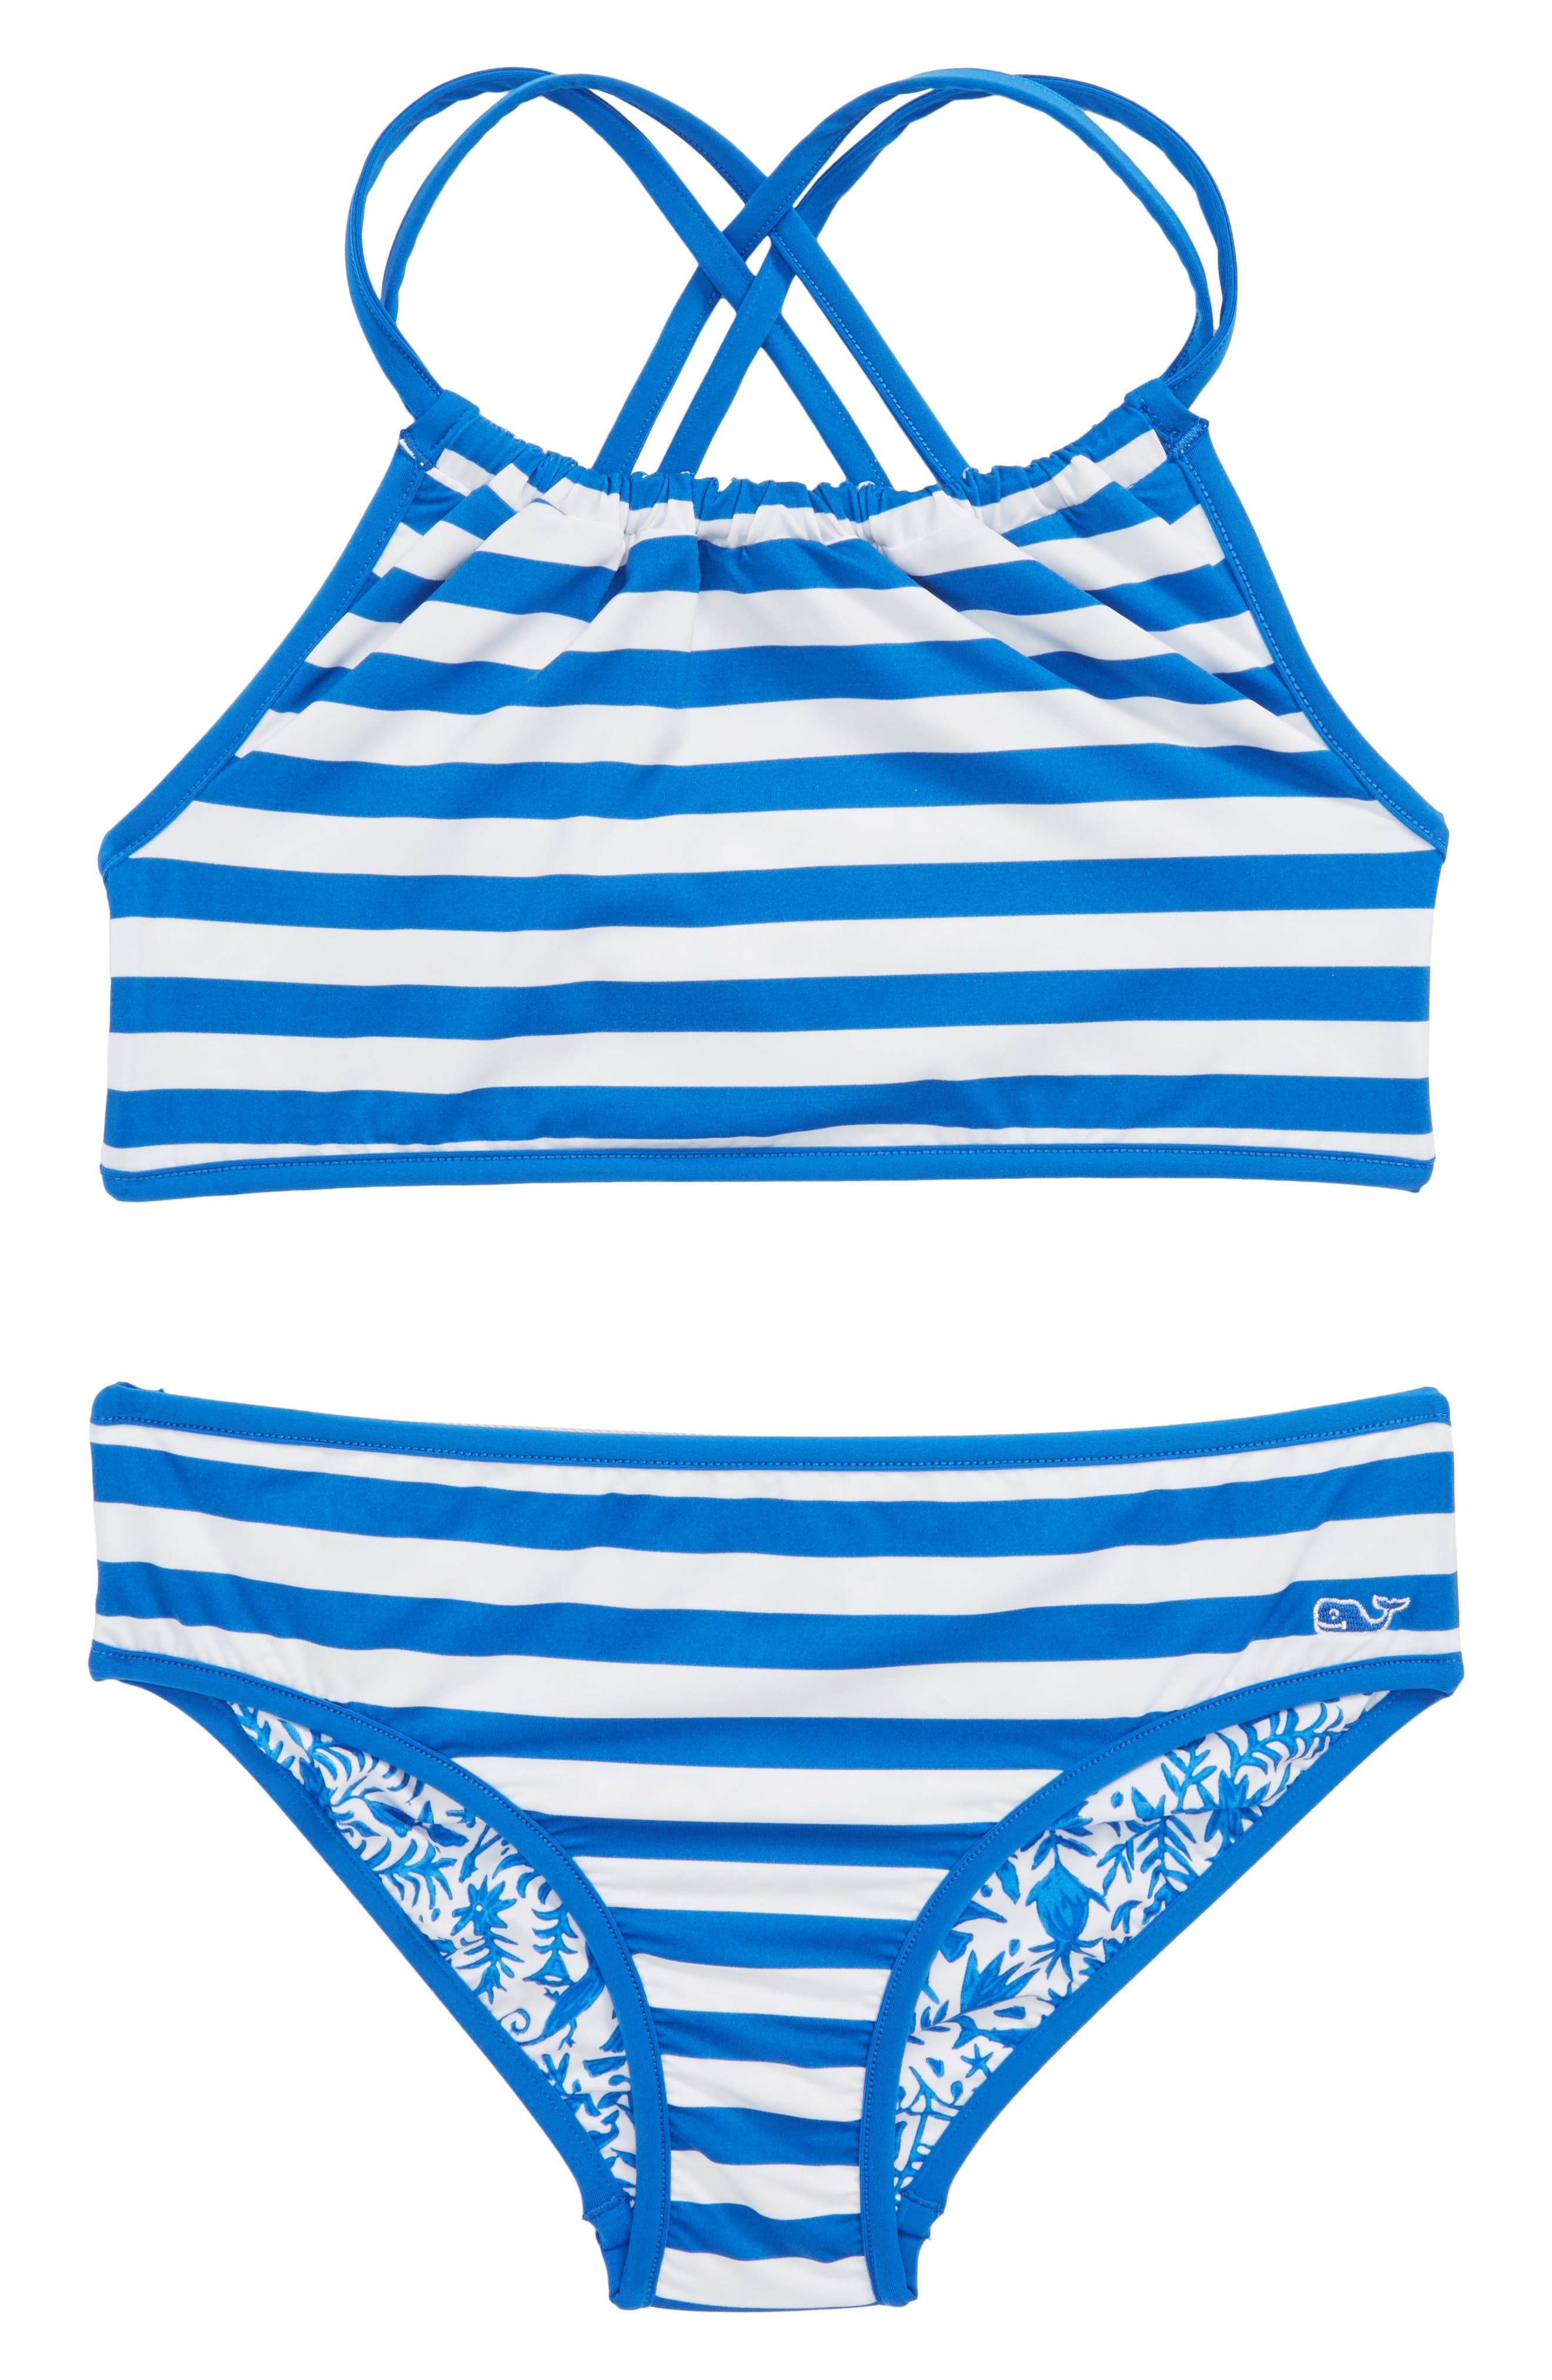 Bahama Otomi Reversible Two-Piece Swimsuit,                             Alternate thumbnail 2, color,                             400